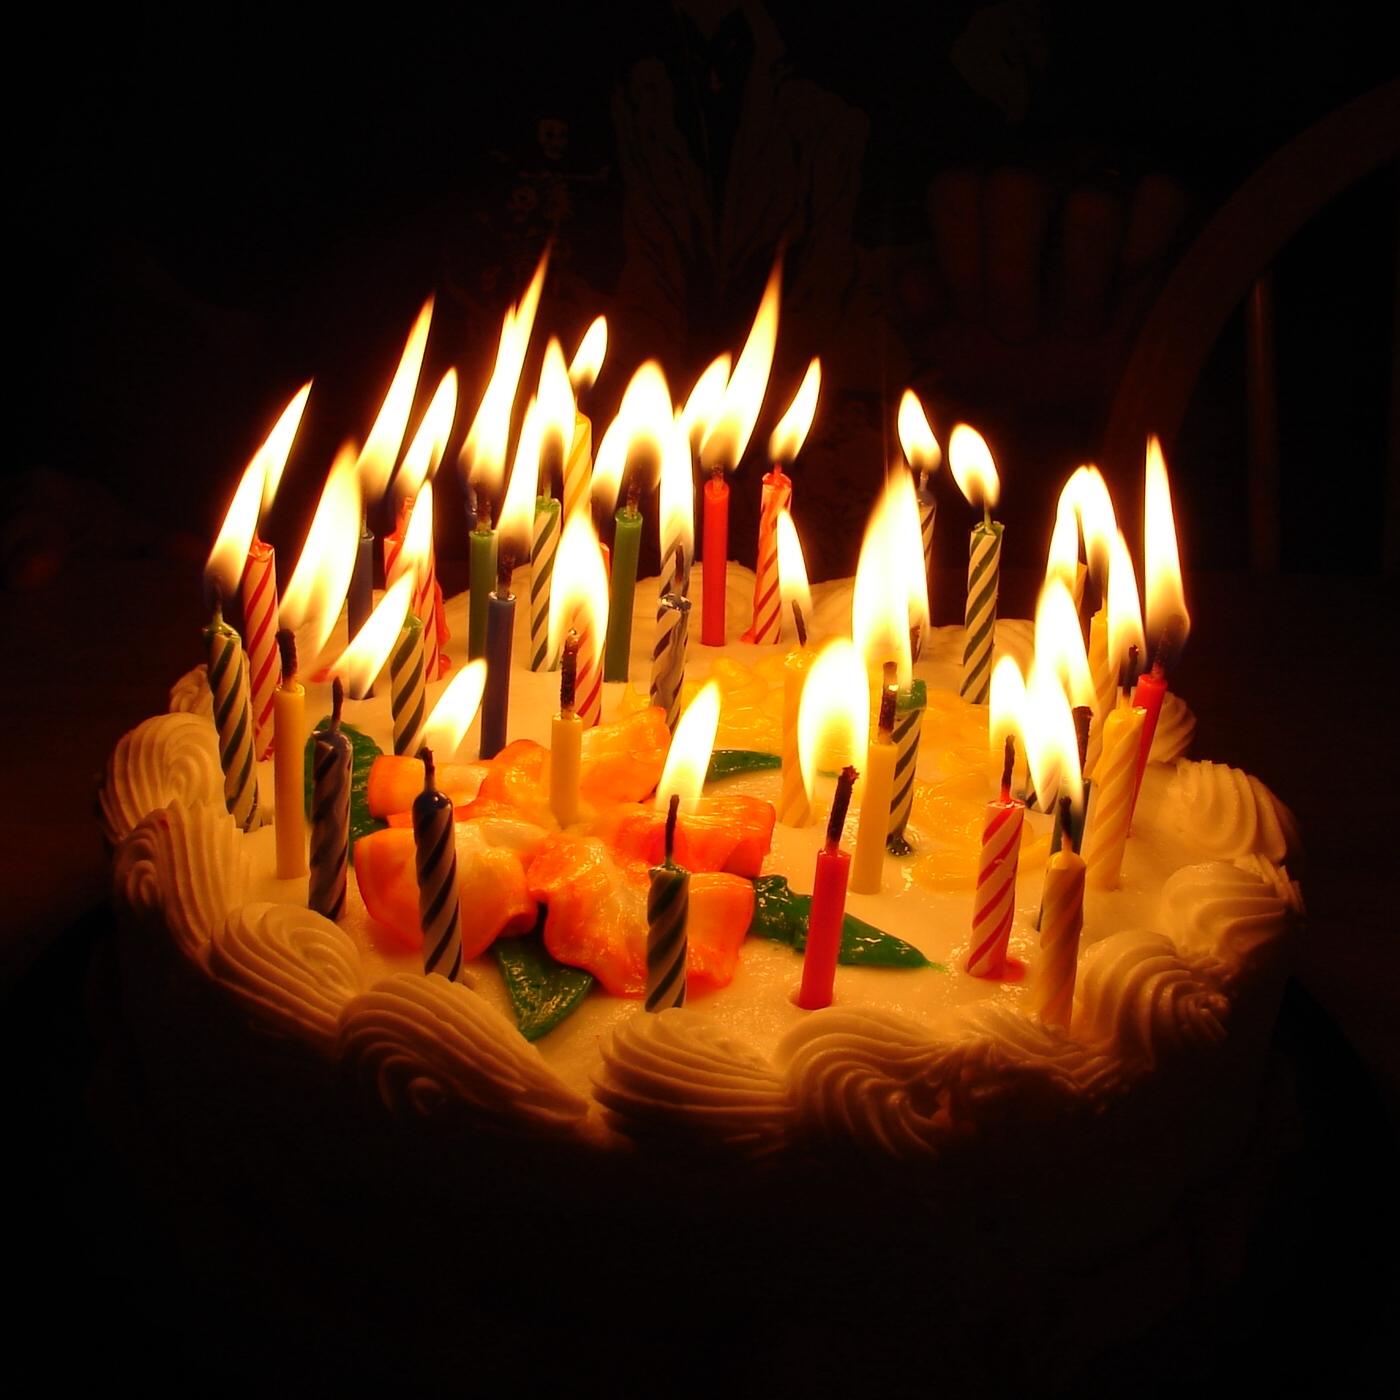 http://2.bp.blogspot.com/-Mboct6QEn_U/UUXsK-iZjmI/AAAAAAABMmI/Q_SN0E7hk8E/s1600/hinh+nen+sinh+nhat,+happy+birthday+wallpaper+(6).jpg